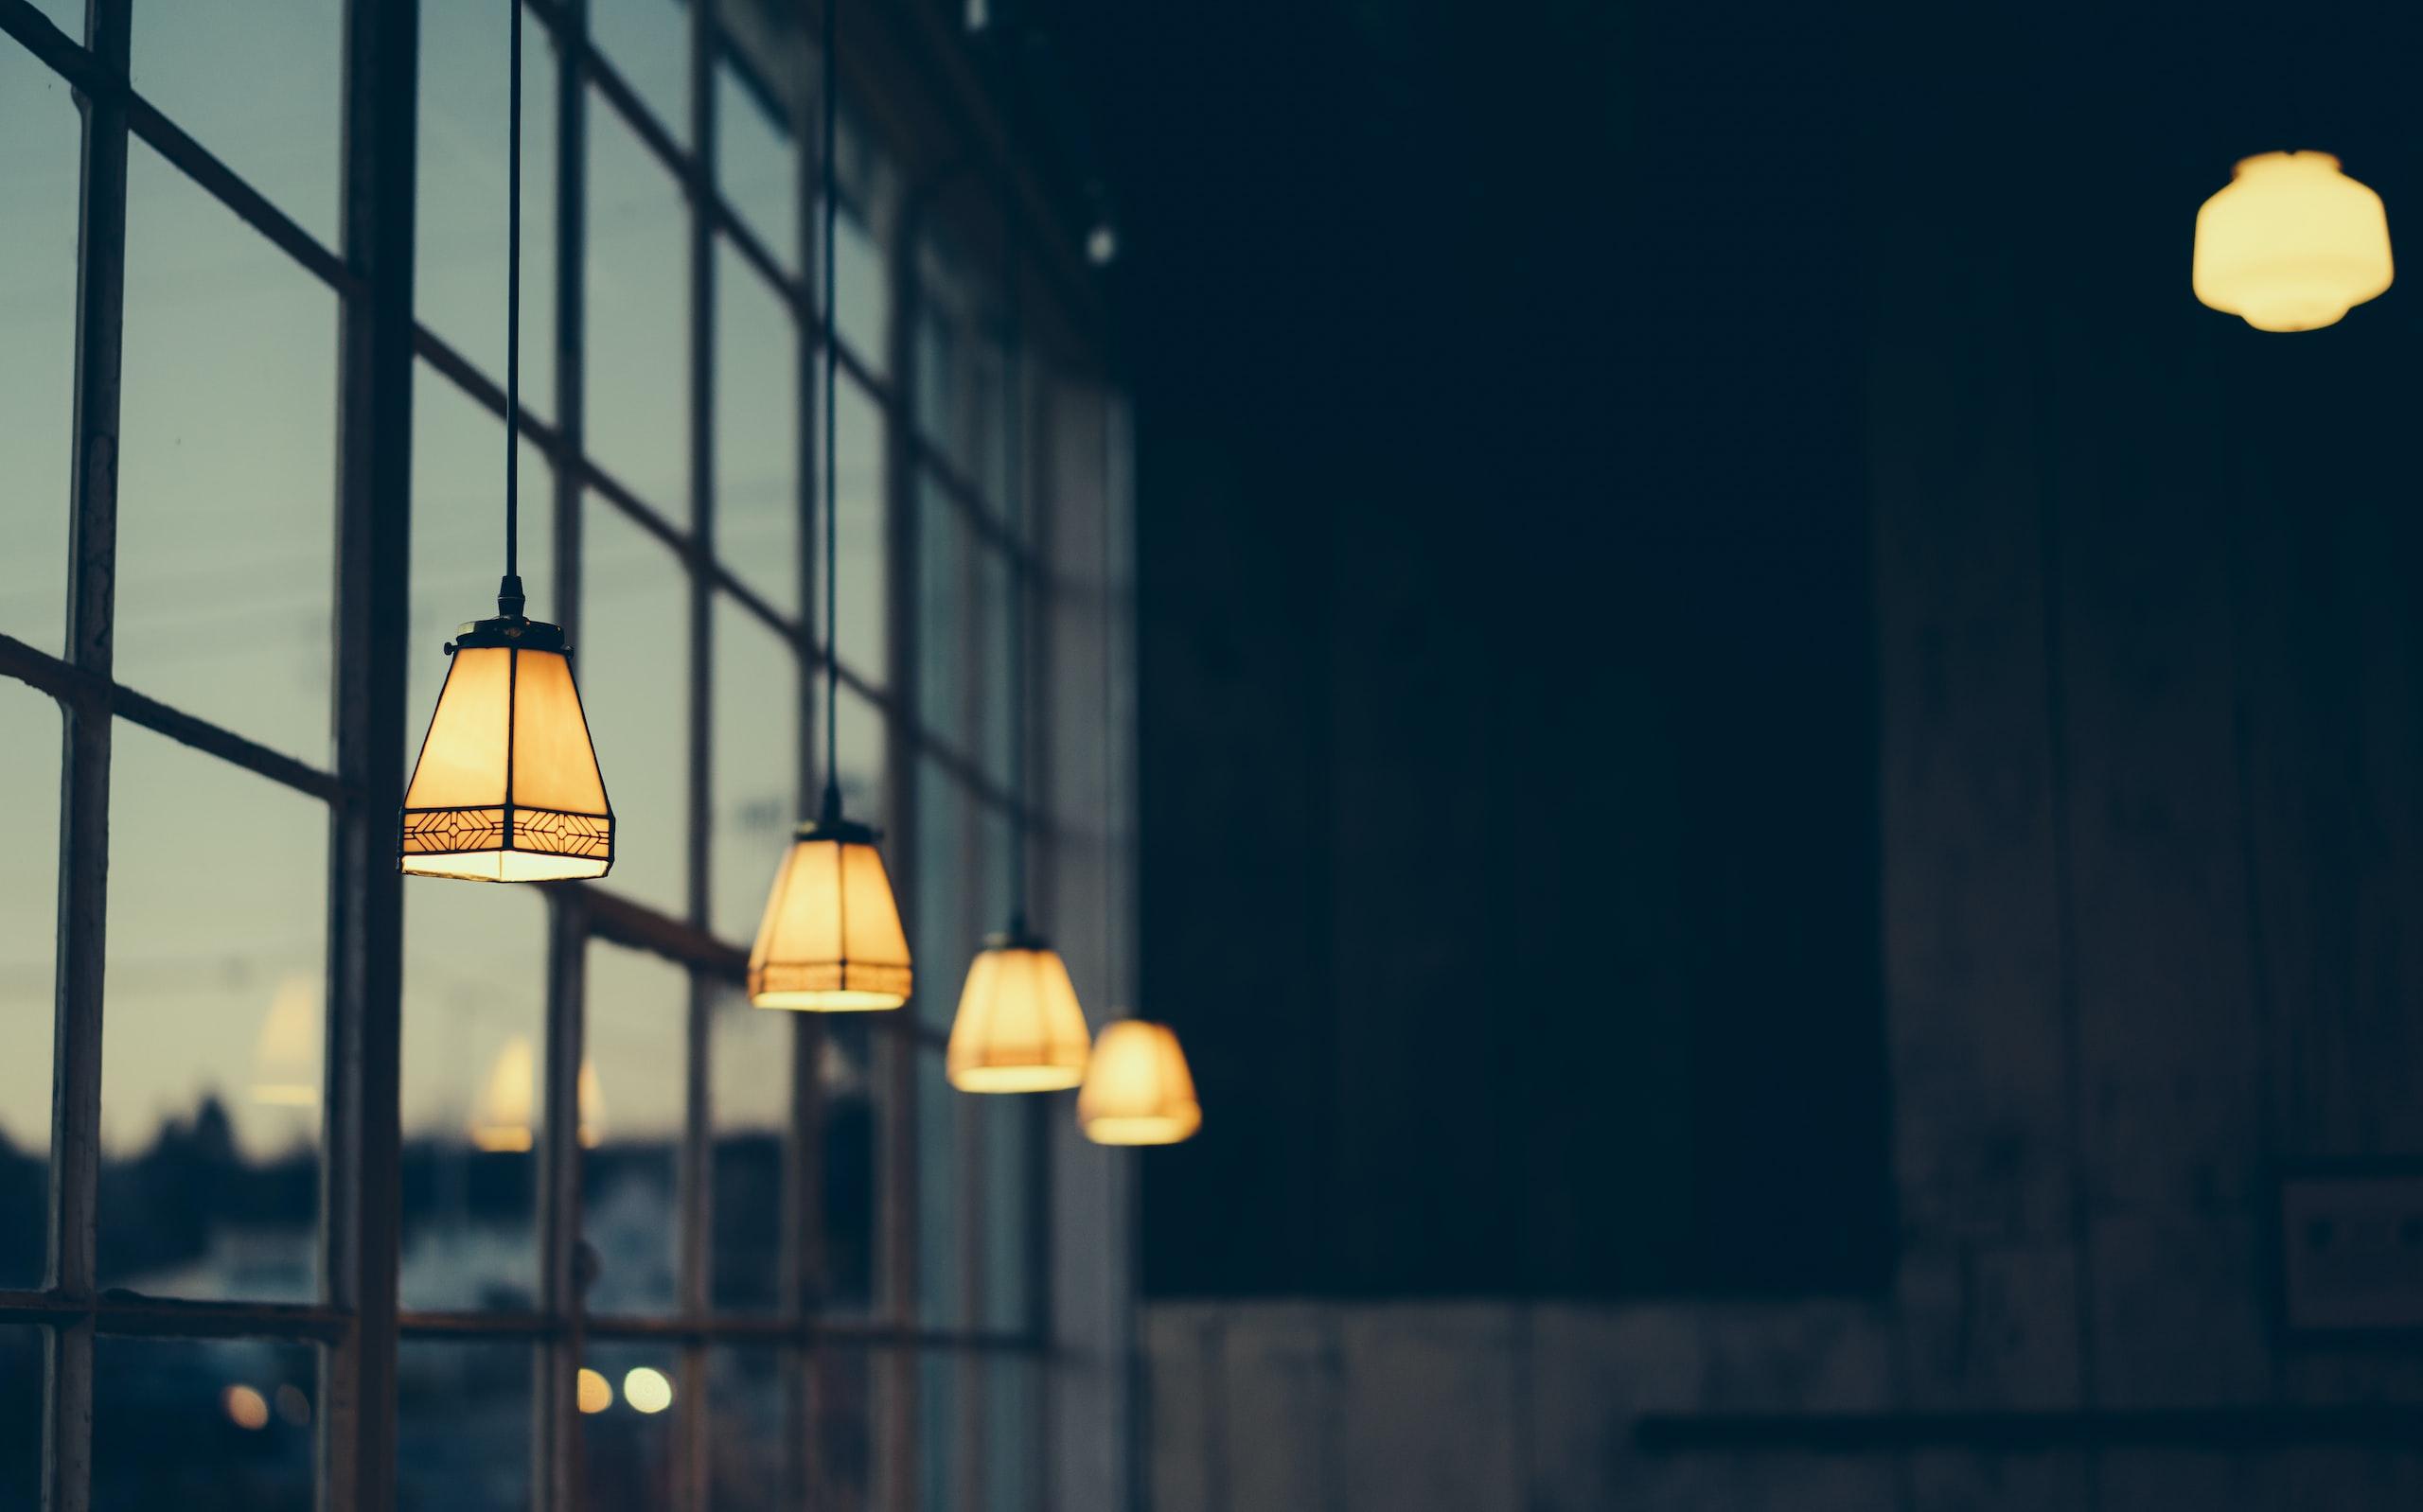 Yellow lamps near a window